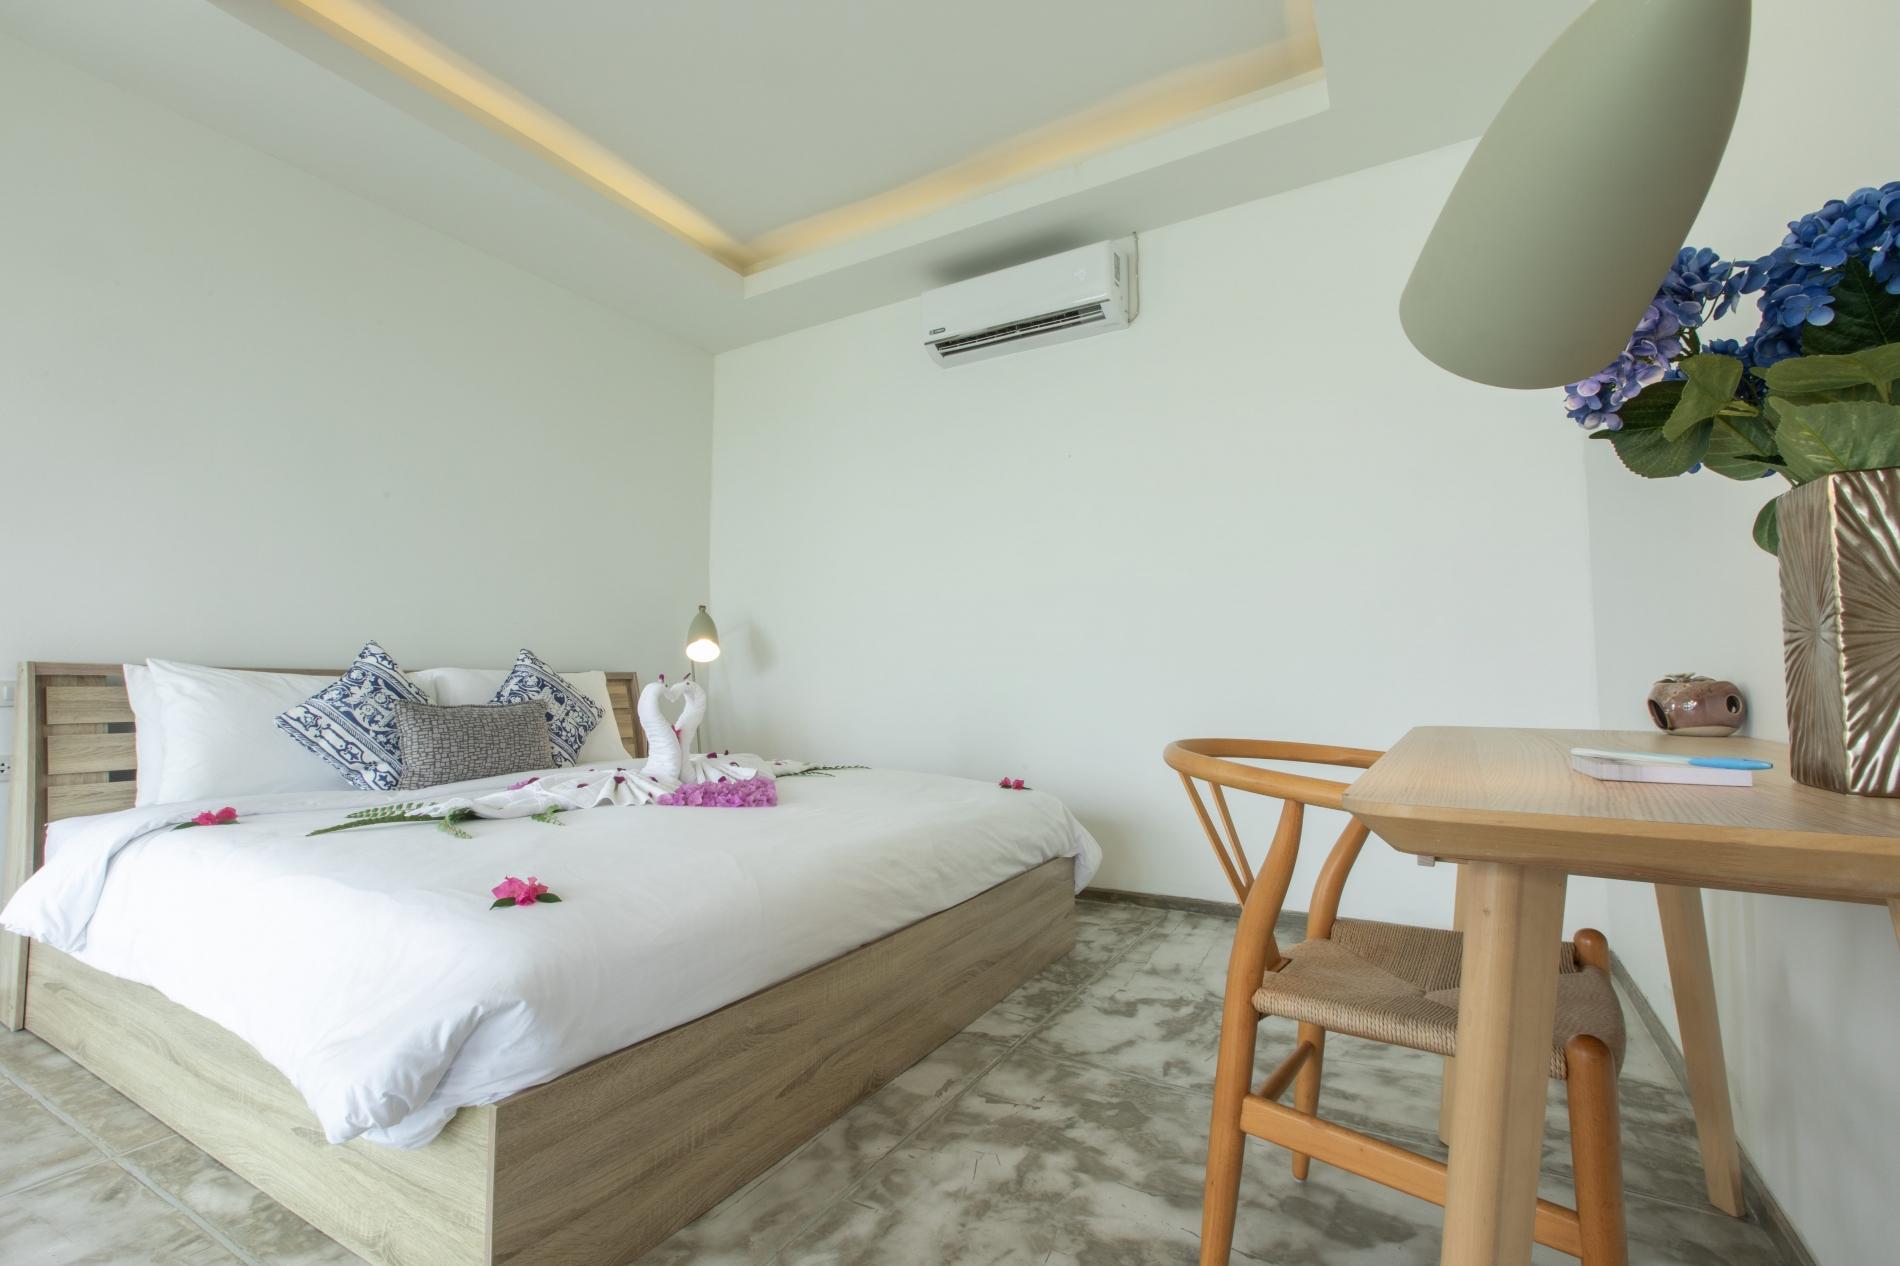 Apartment Beachfront and seaview apartment for 4 on Kamala - KBE photo 19255262